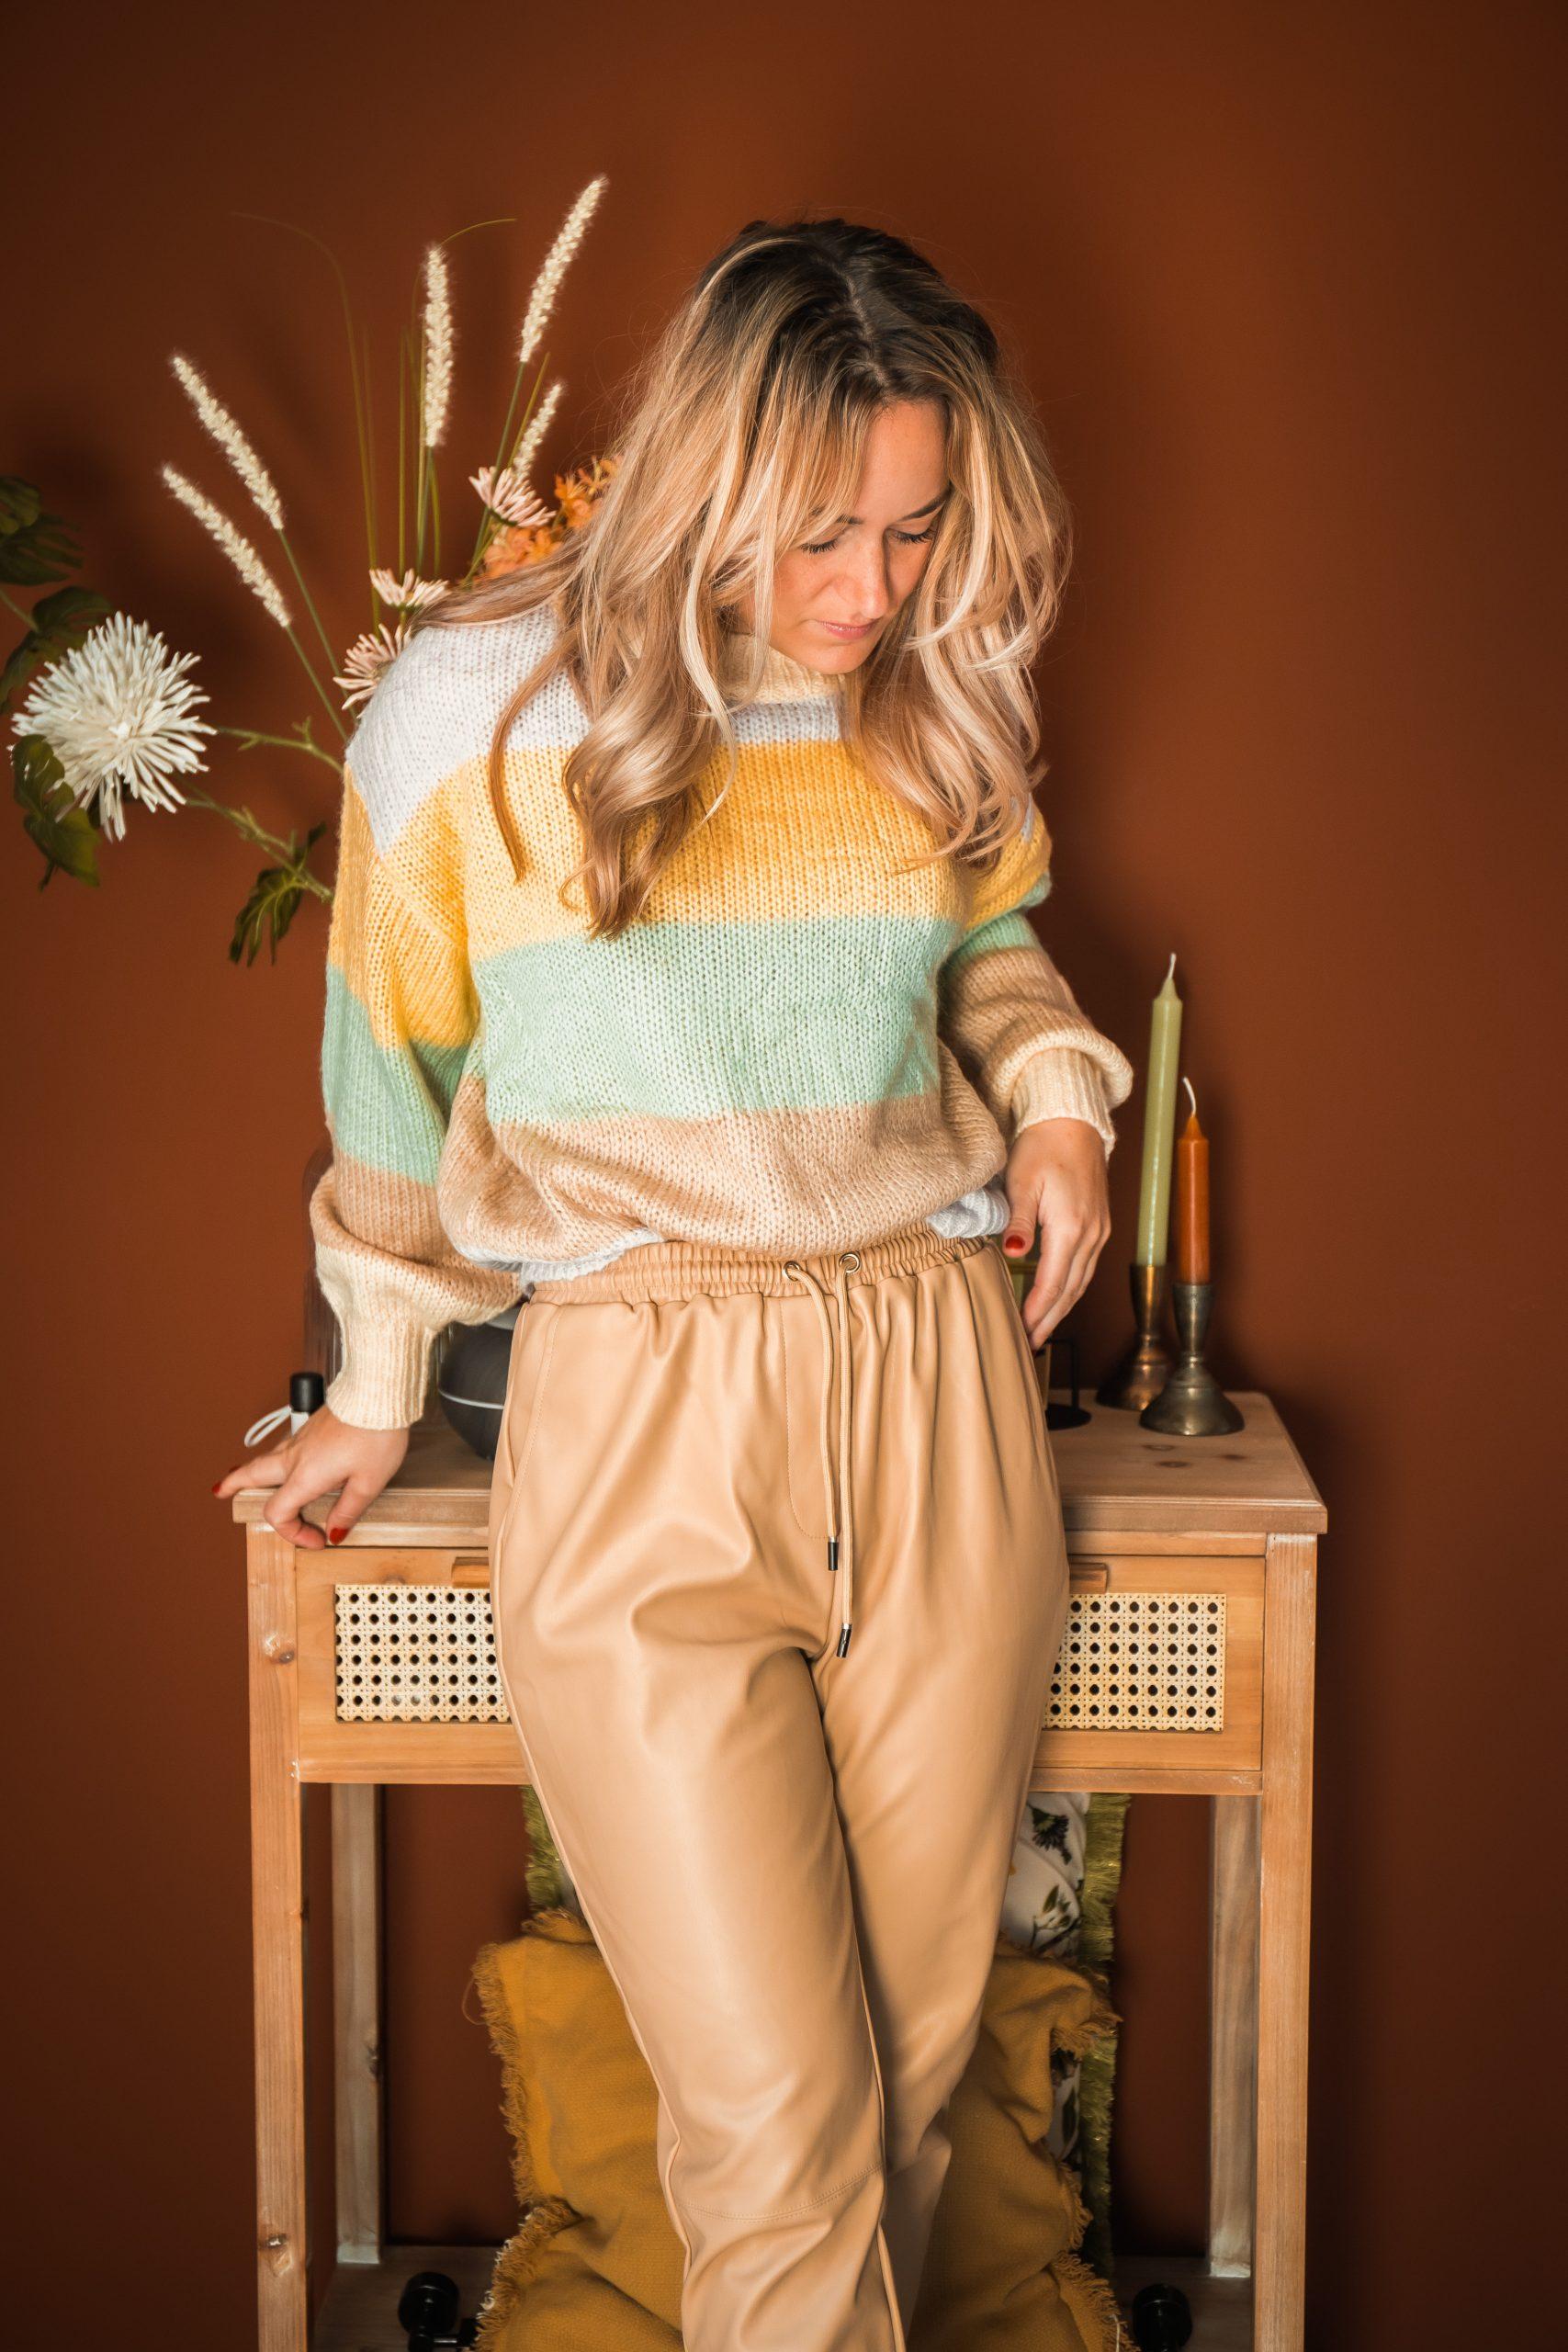 guts & gusto, beige, najaar, herfst, outfit, gutsgusto, leatherlook, leer, interieur, thuis